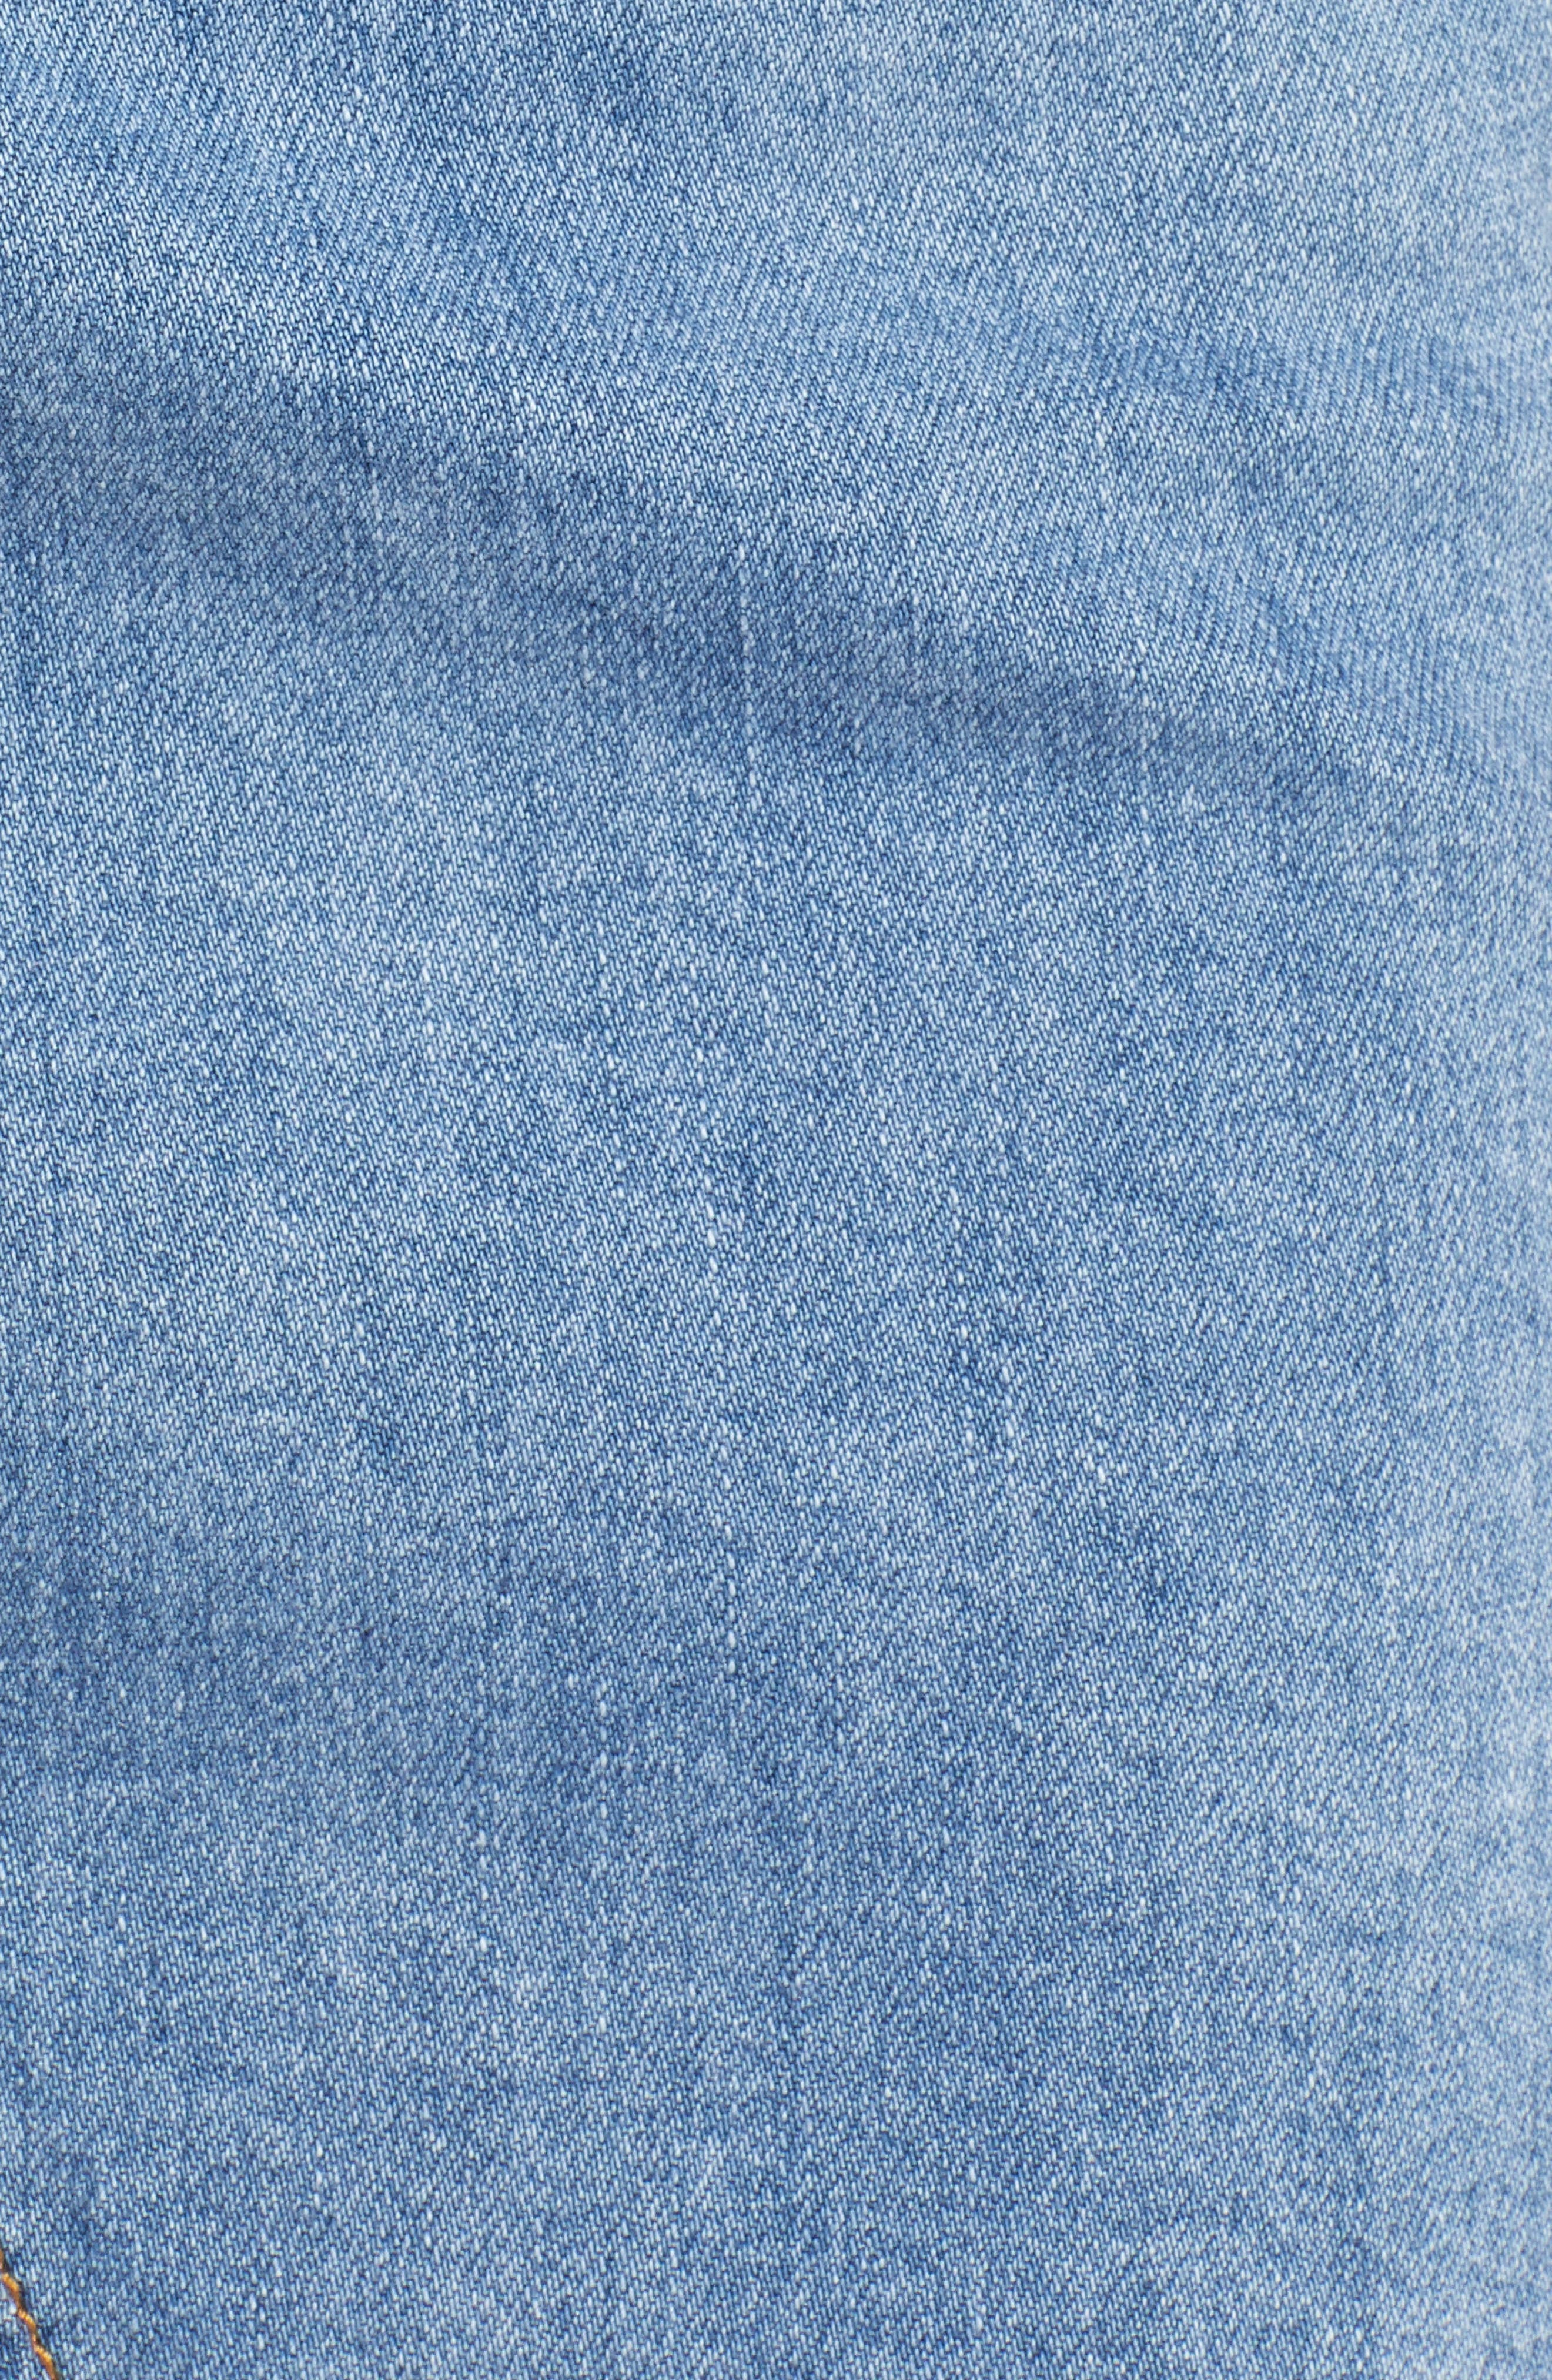 AFRM,                             Distressed Denim Skirt,                             Alternate thumbnail 6, color,                             400